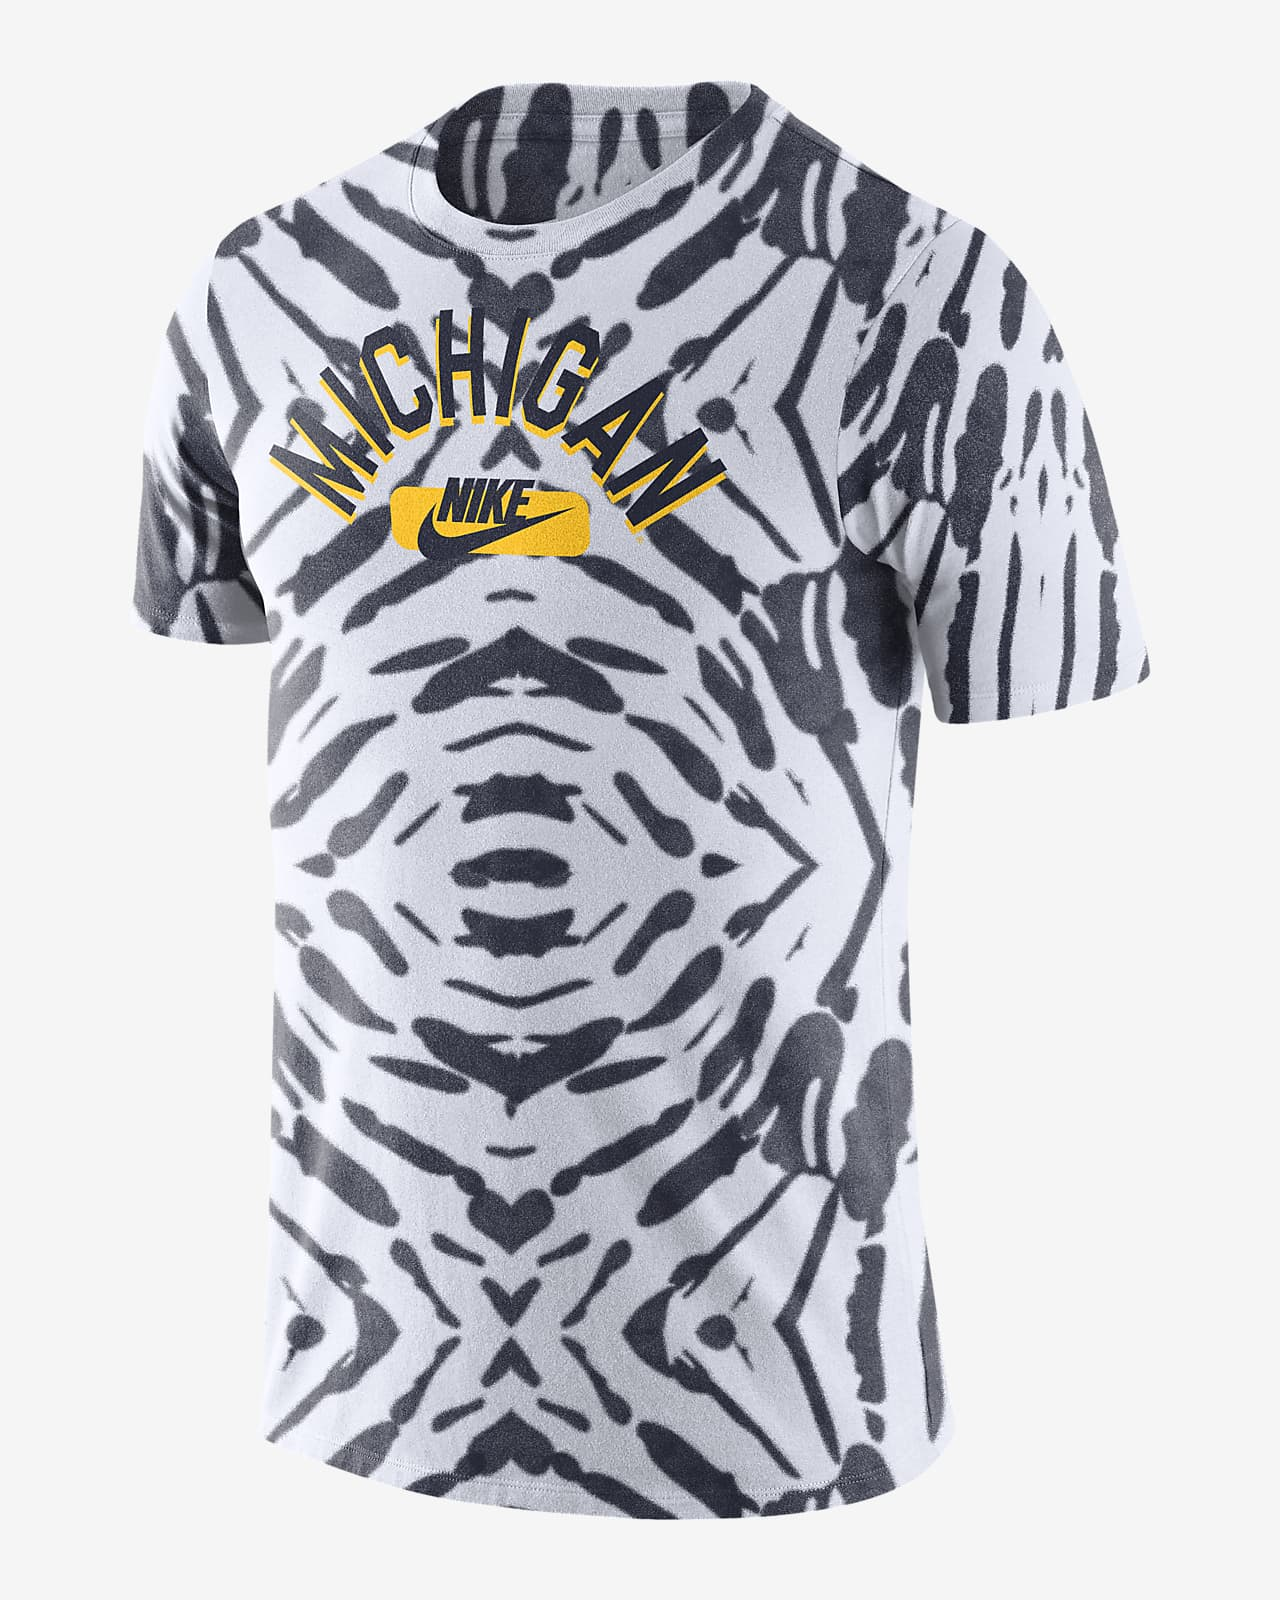 Nike College (Michigan) Men's Printed T-Shirt